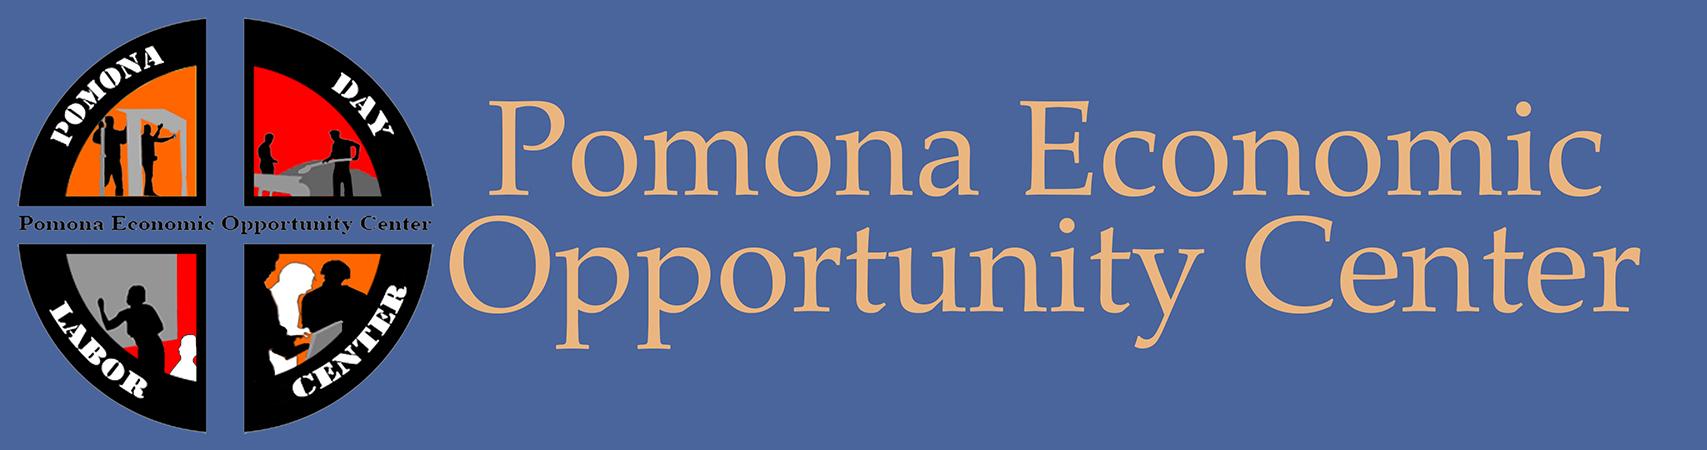 Pomona Economic Opportunity Center